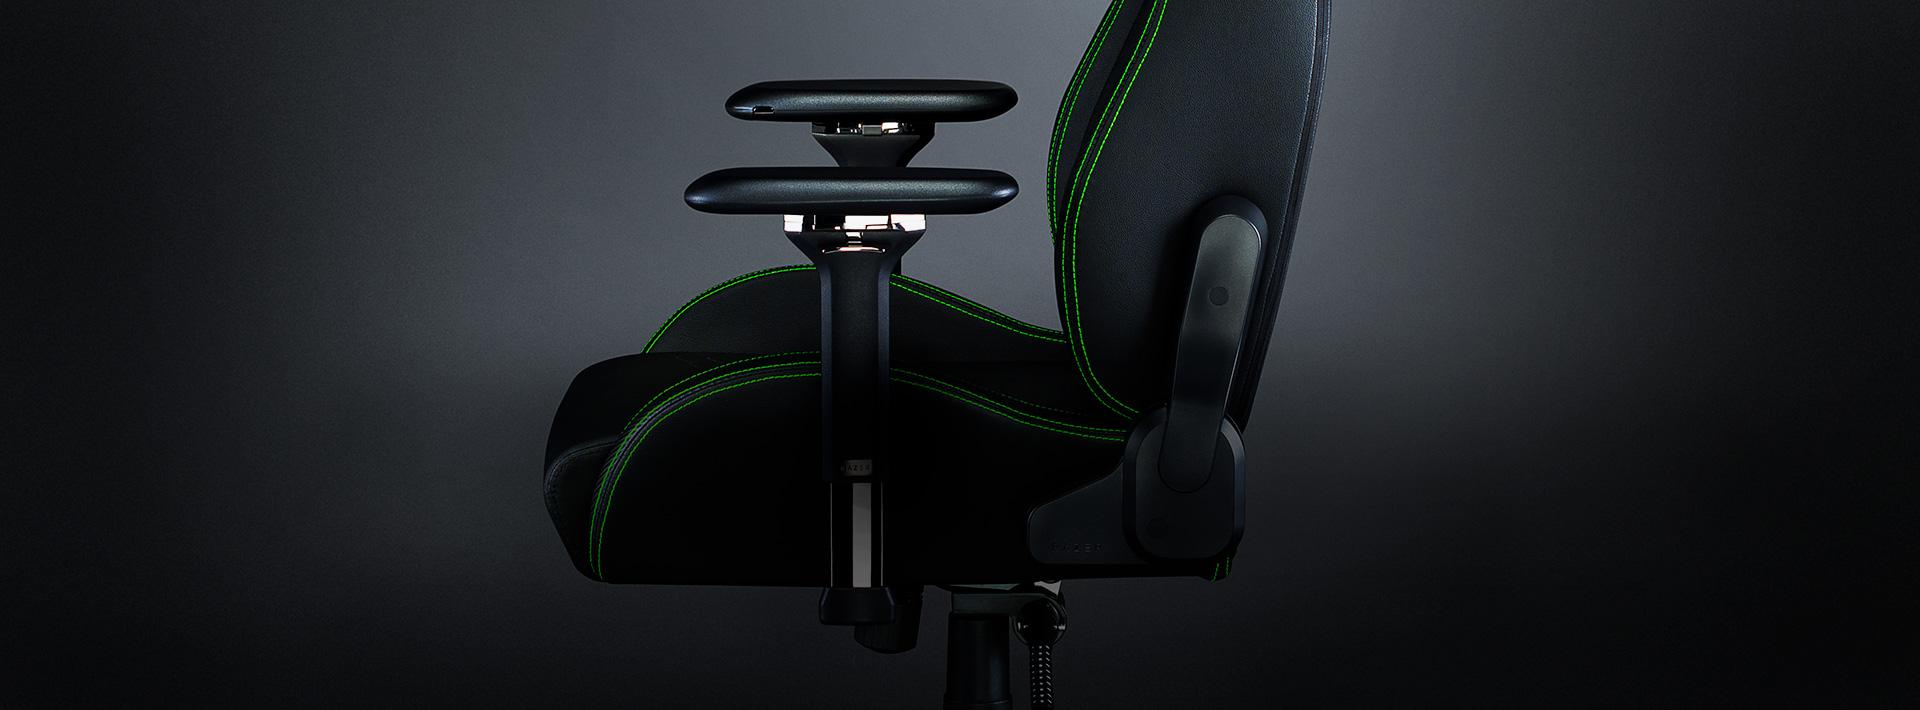 Ghế game Razer Iskur Gaming Chair w/ Lumbar Support  trang bị tay ghế 4d